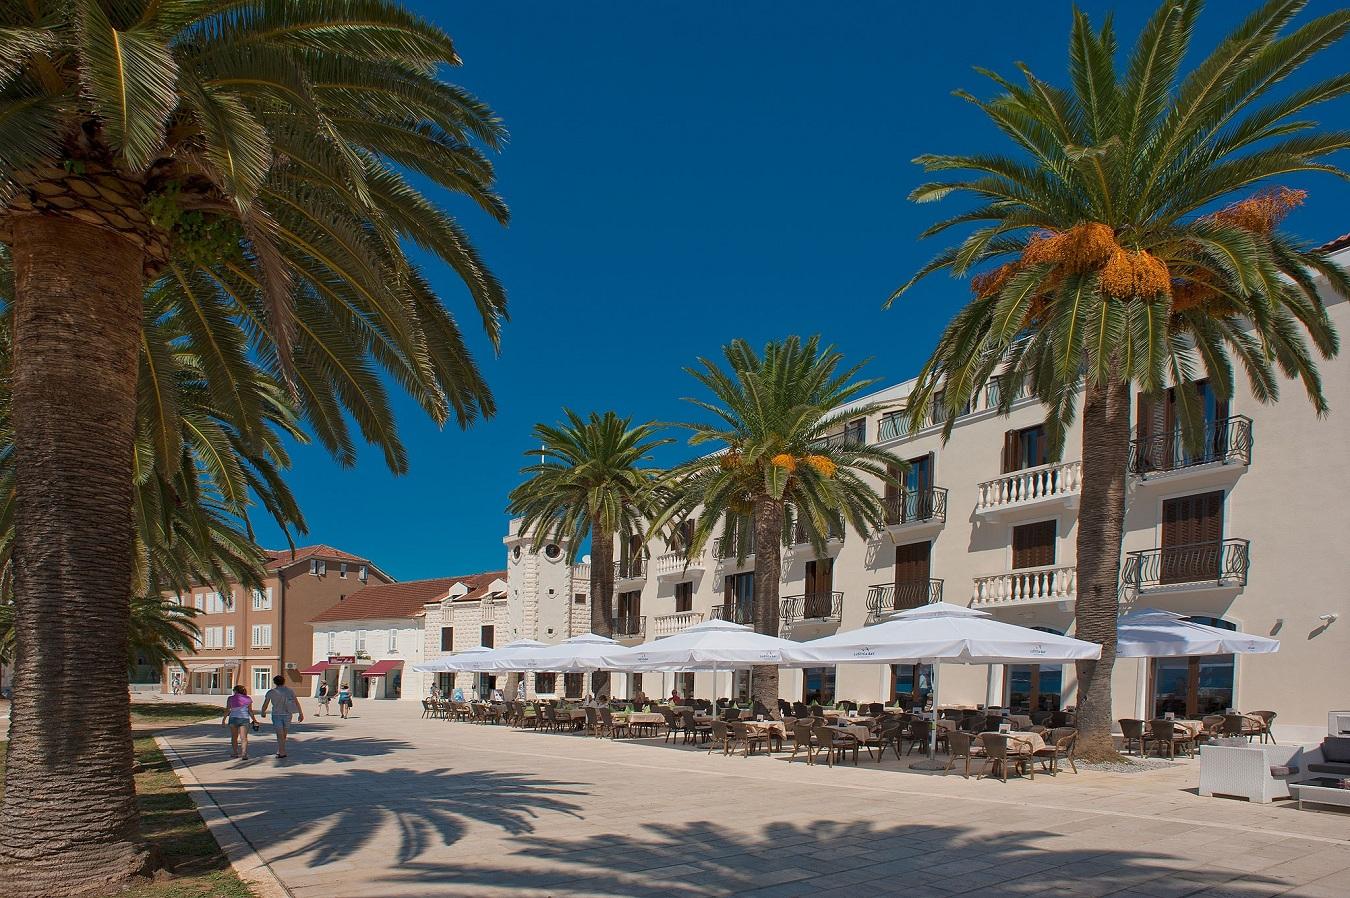 Pine Hotel Tivat